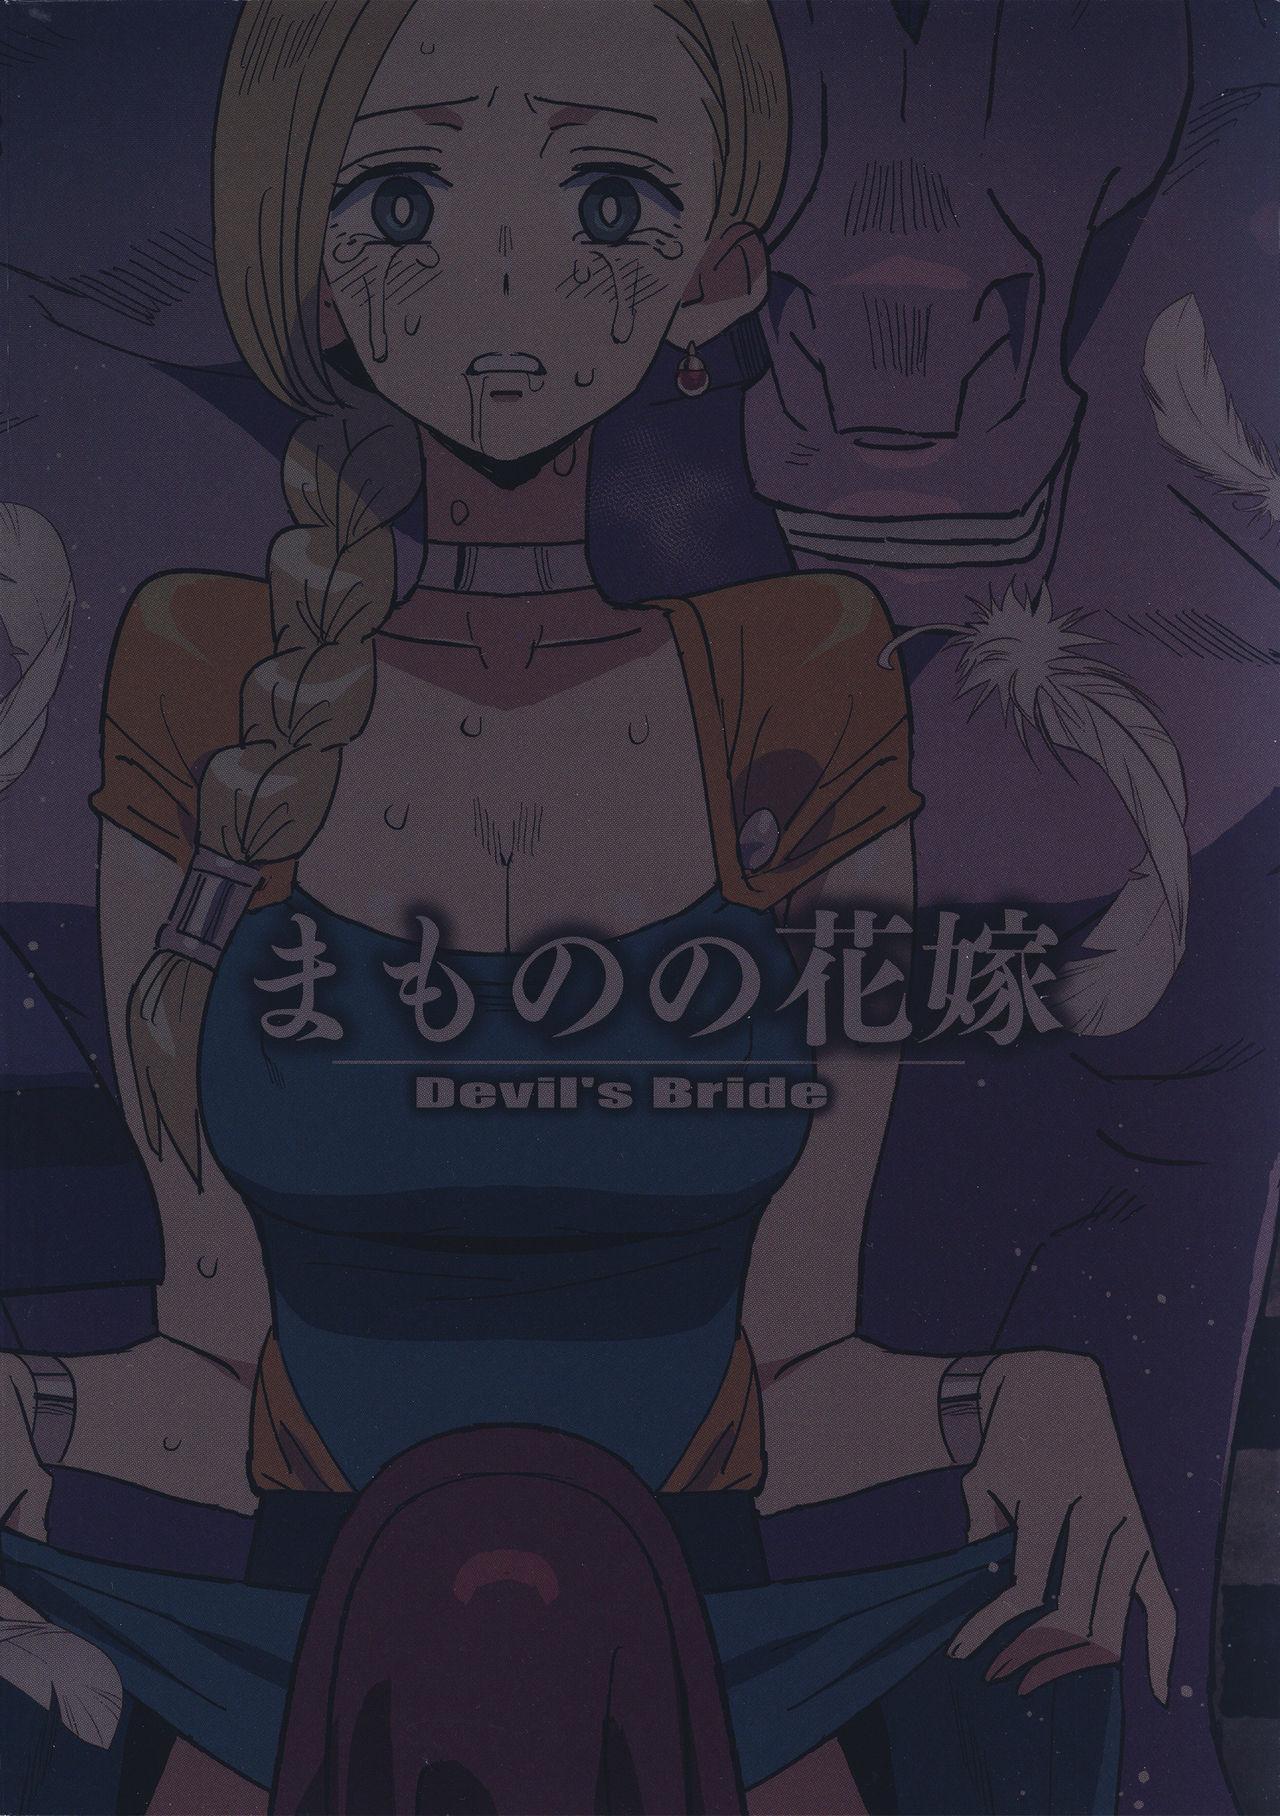 Mamono no Hanayome - Devil's Bride 17